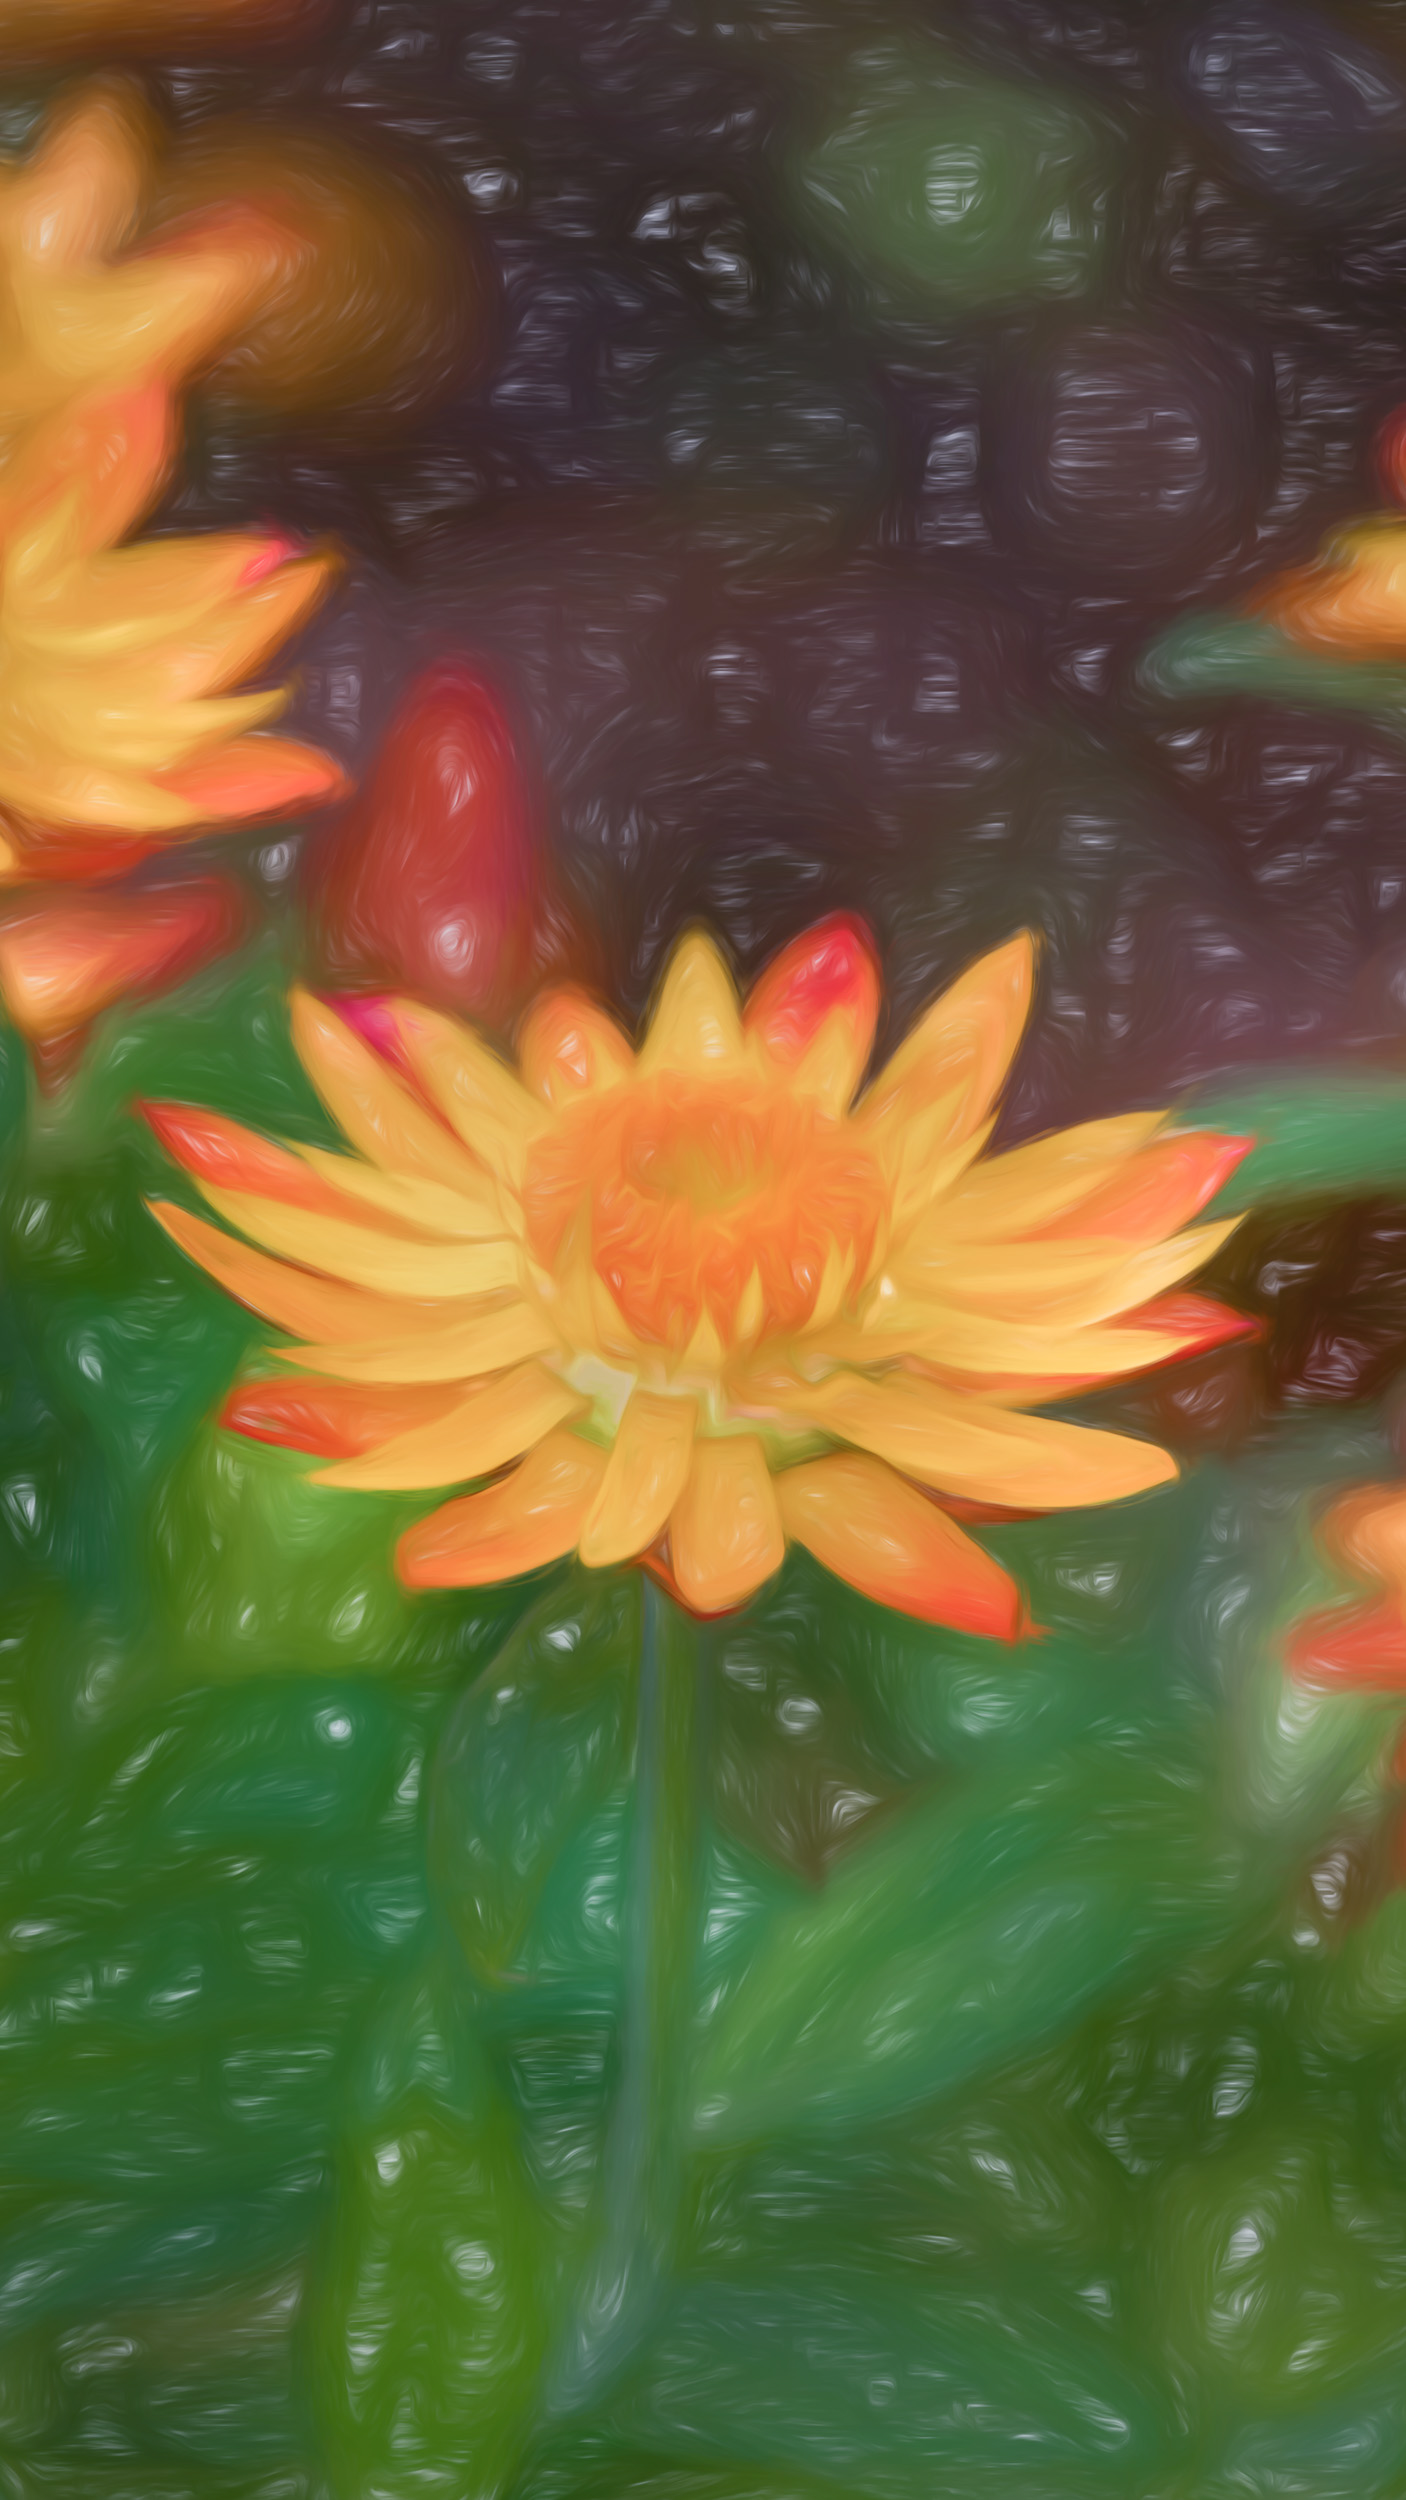 """Strawflower"" Photography Artist Kevin Sibbitt"